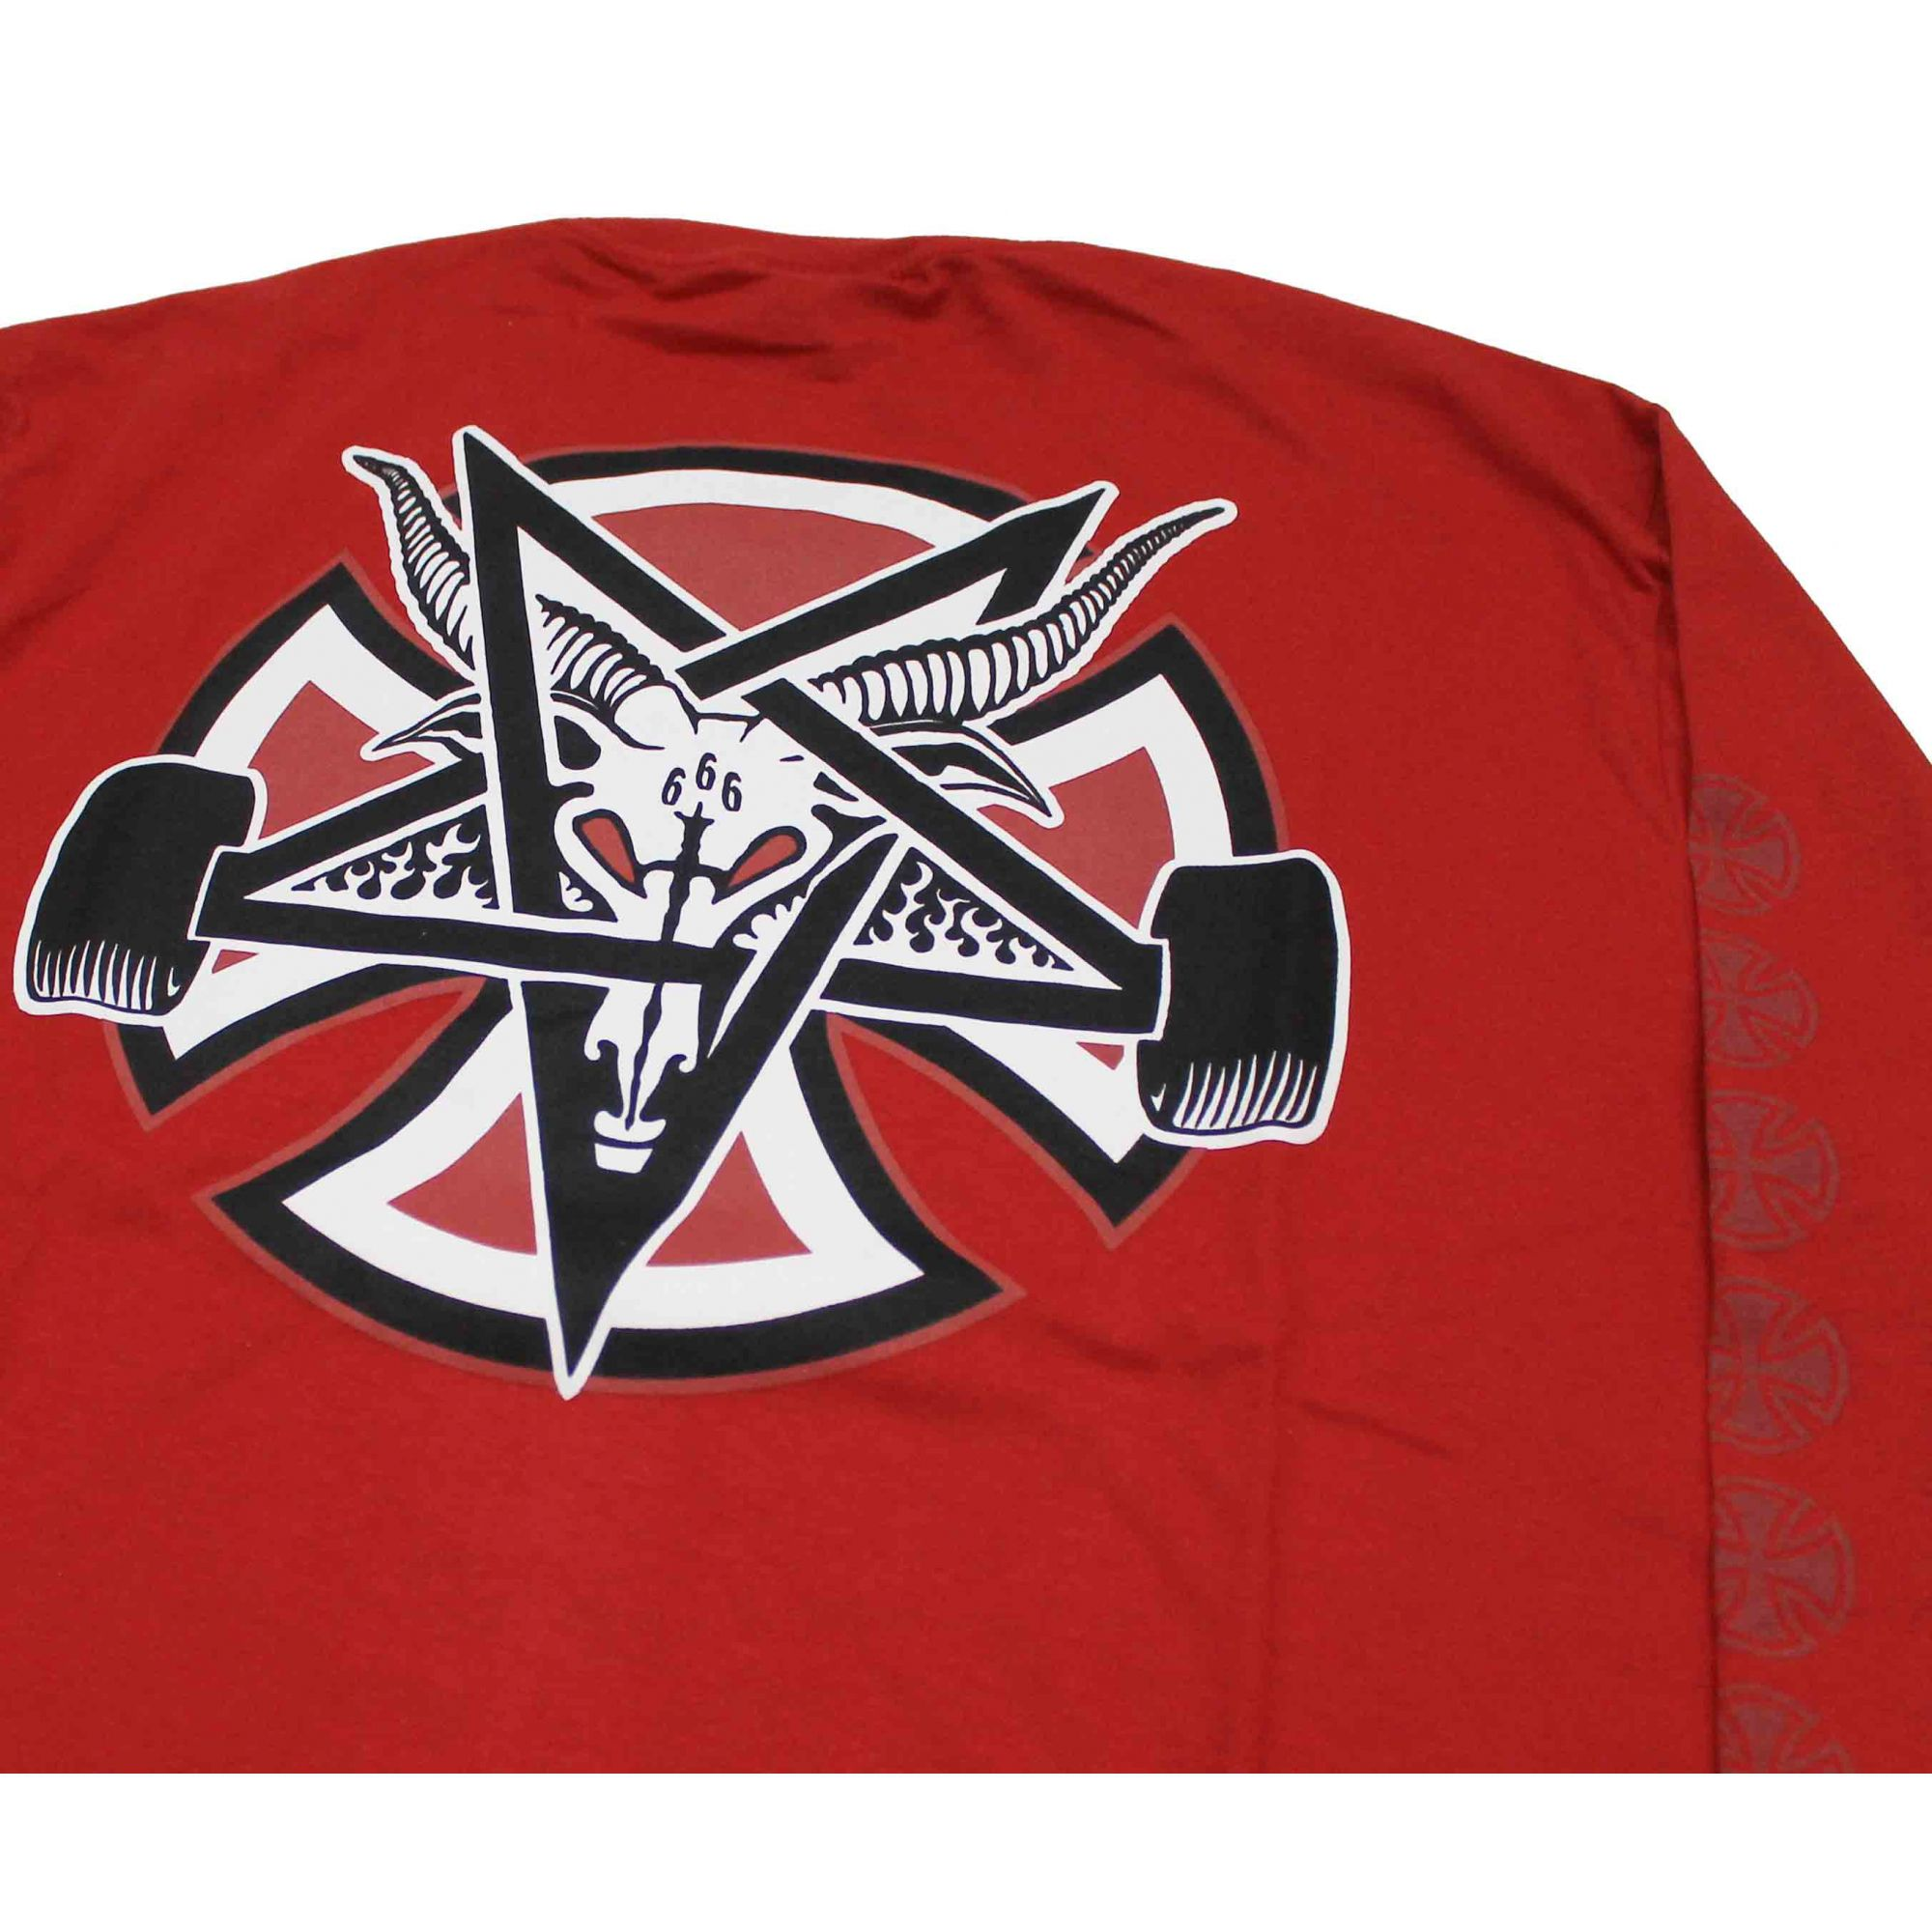 Camiseta Manga Longa Thrasher Magazine x Independent Pentagram Cross Red